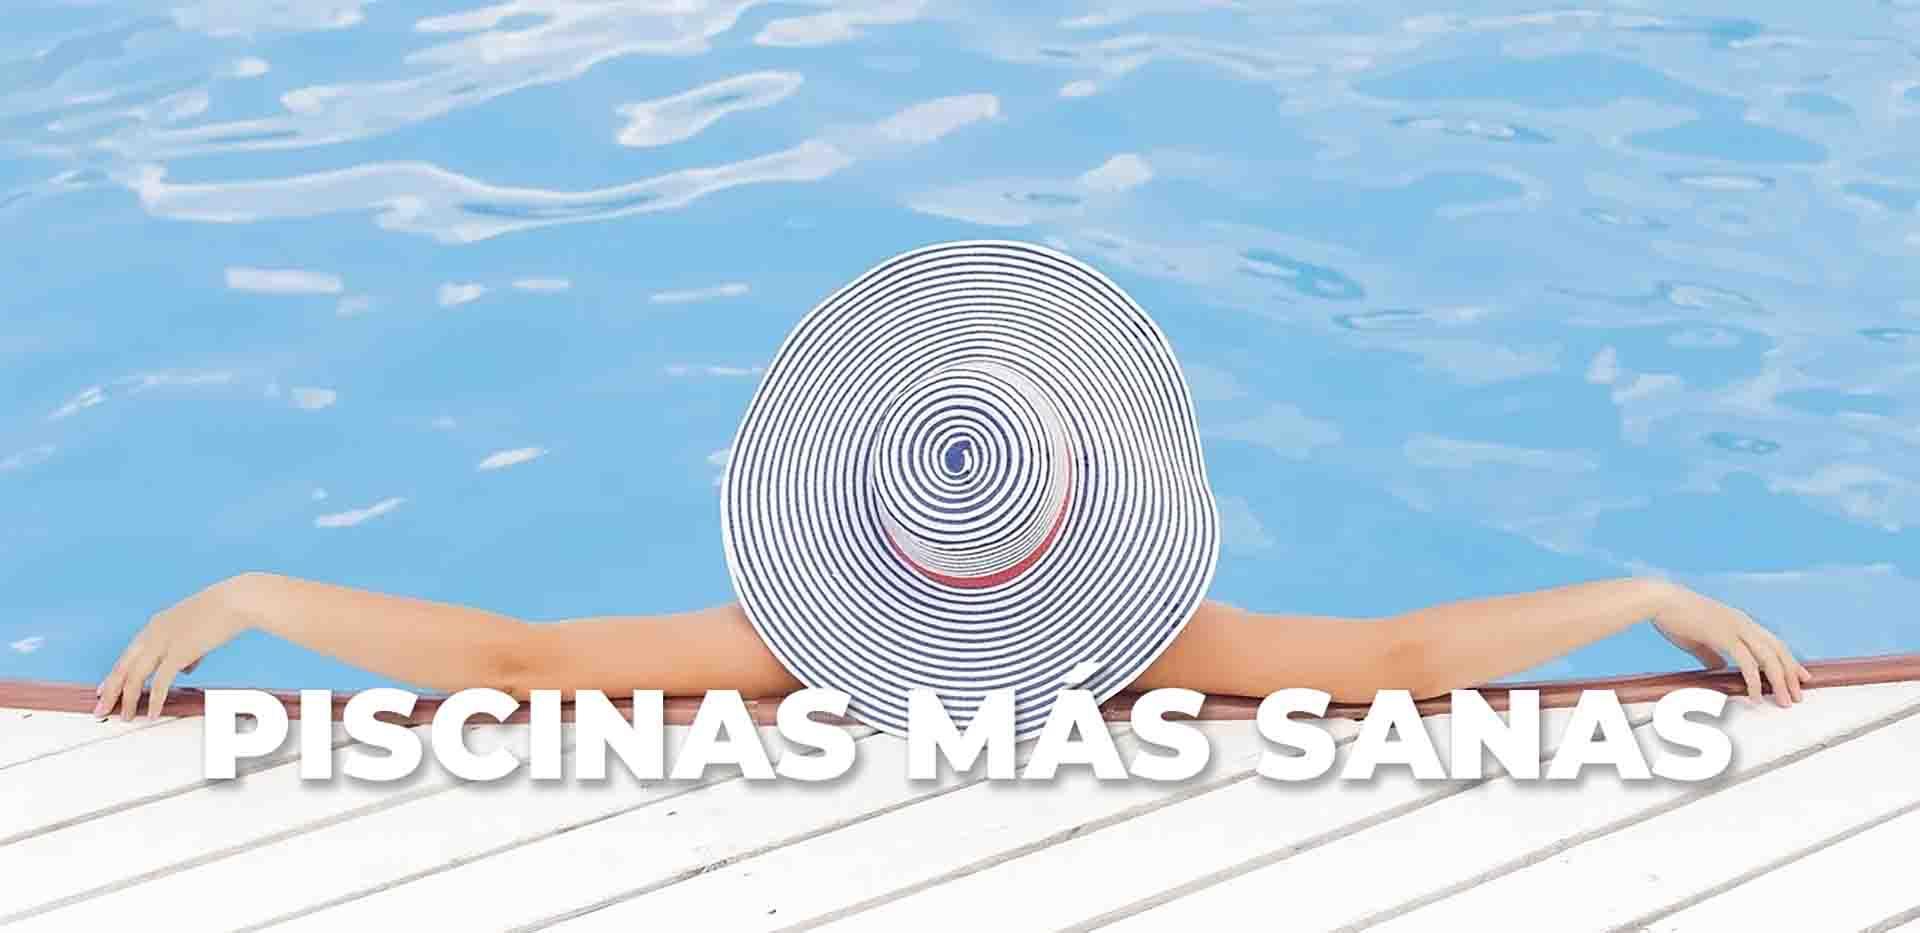 piscinas-mas-sanas-y-limpias